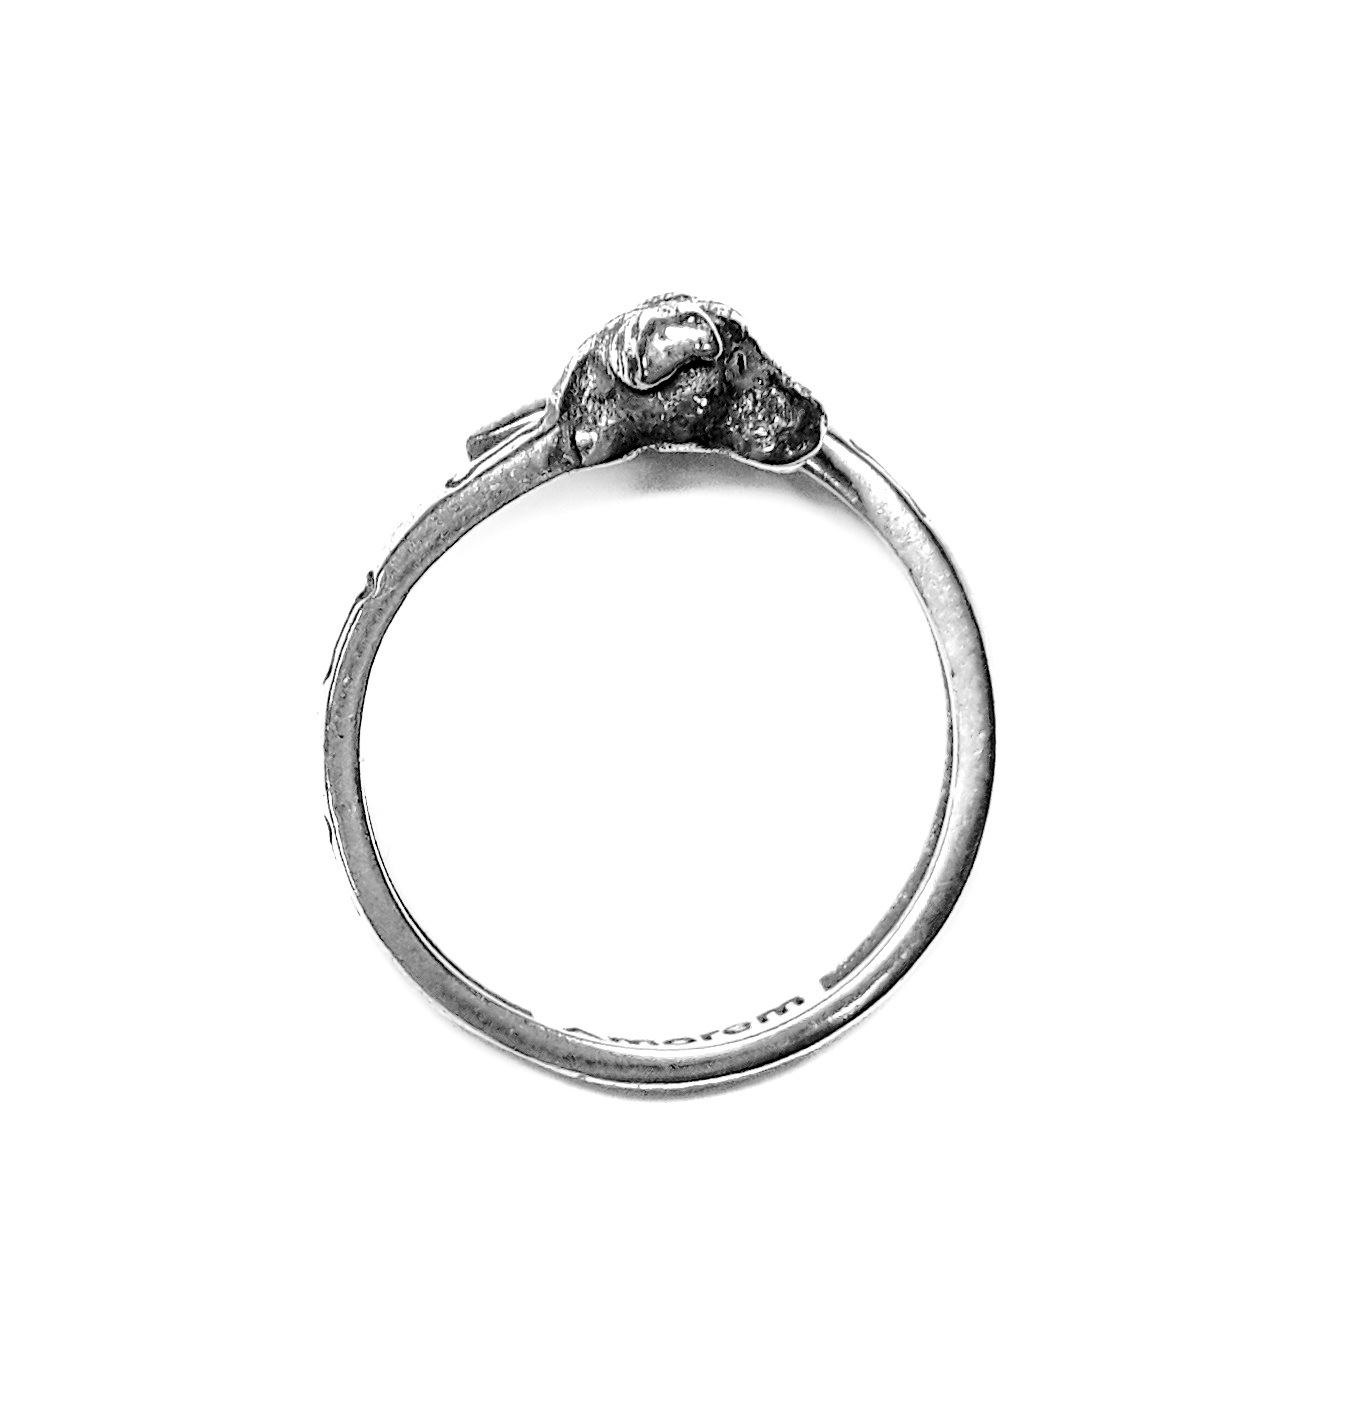 Dog Totem Ring, sterling silver